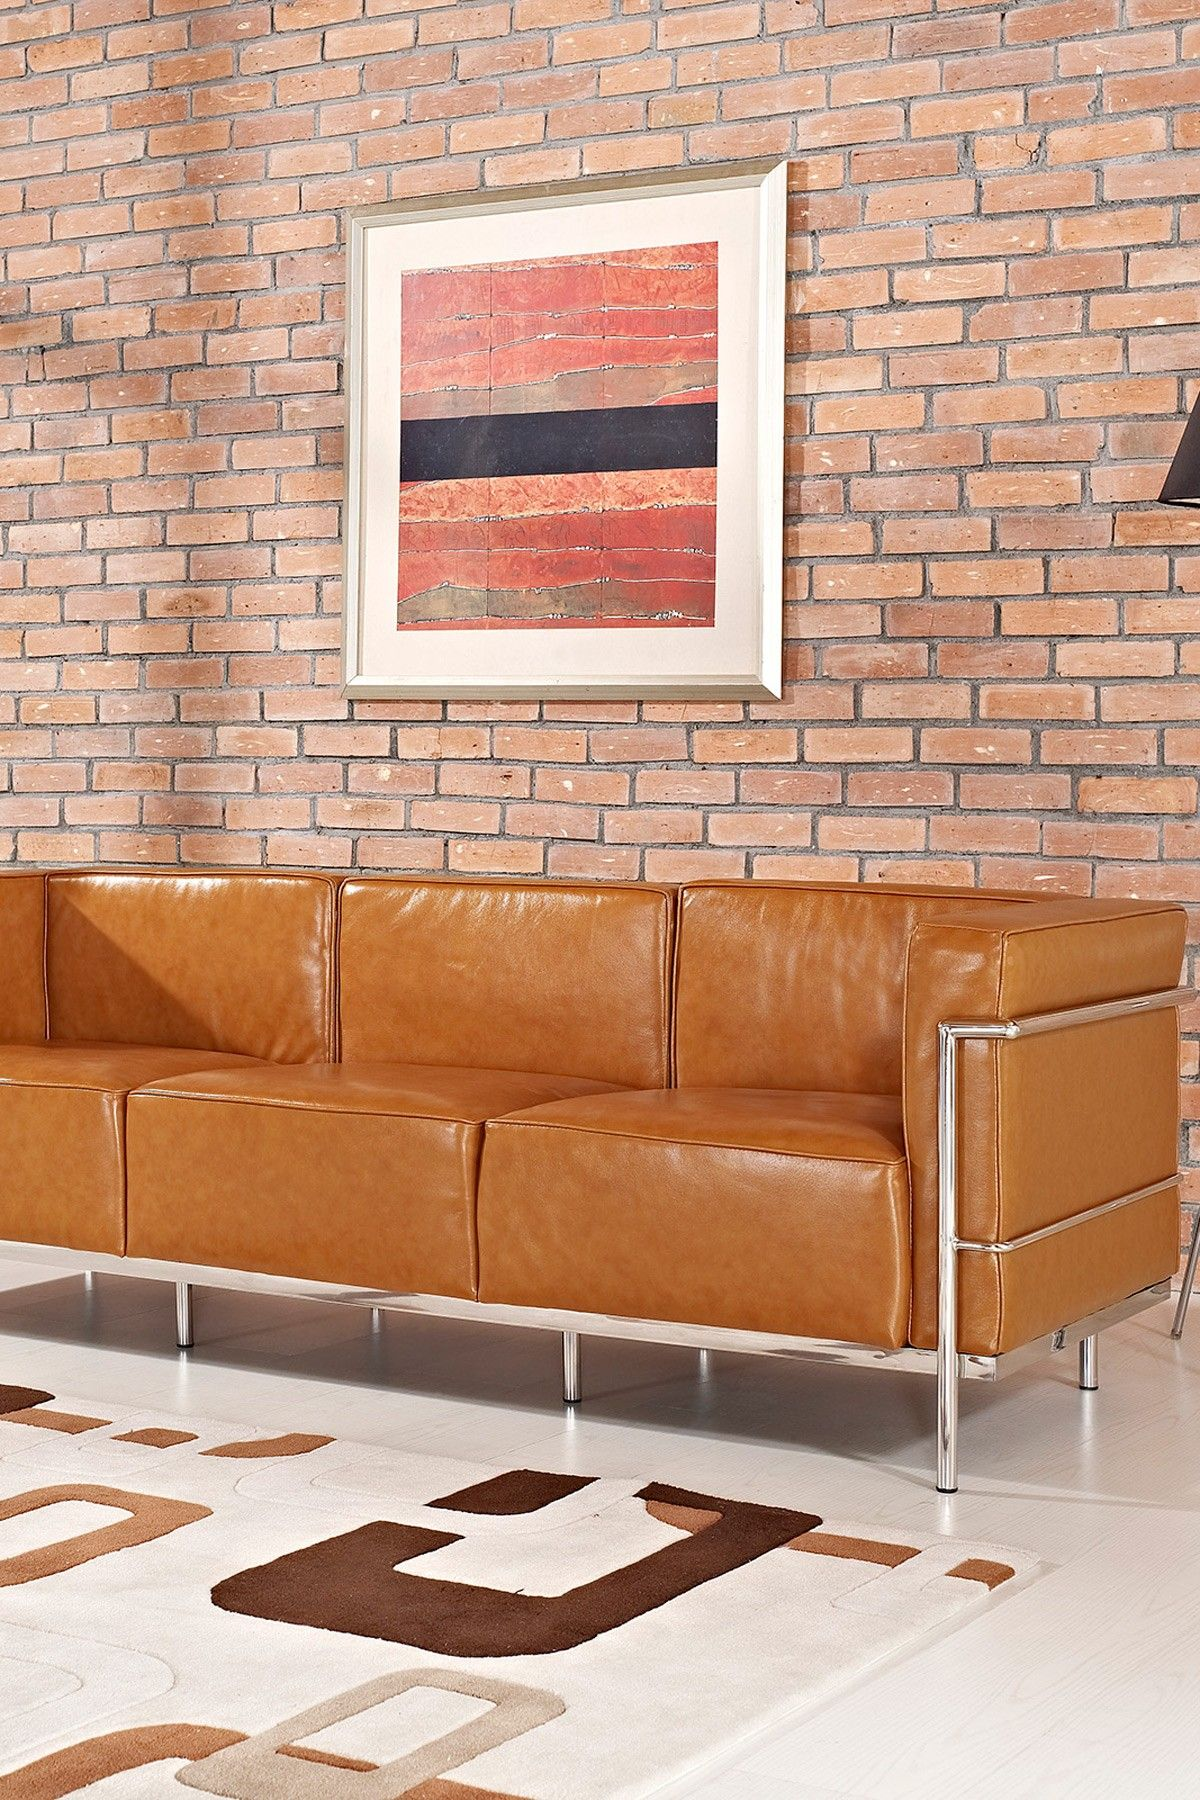 Le Corbusier Leather Sofa Day By Day Pinterest Muebles  # Como Limpiar Muebles Niquelados